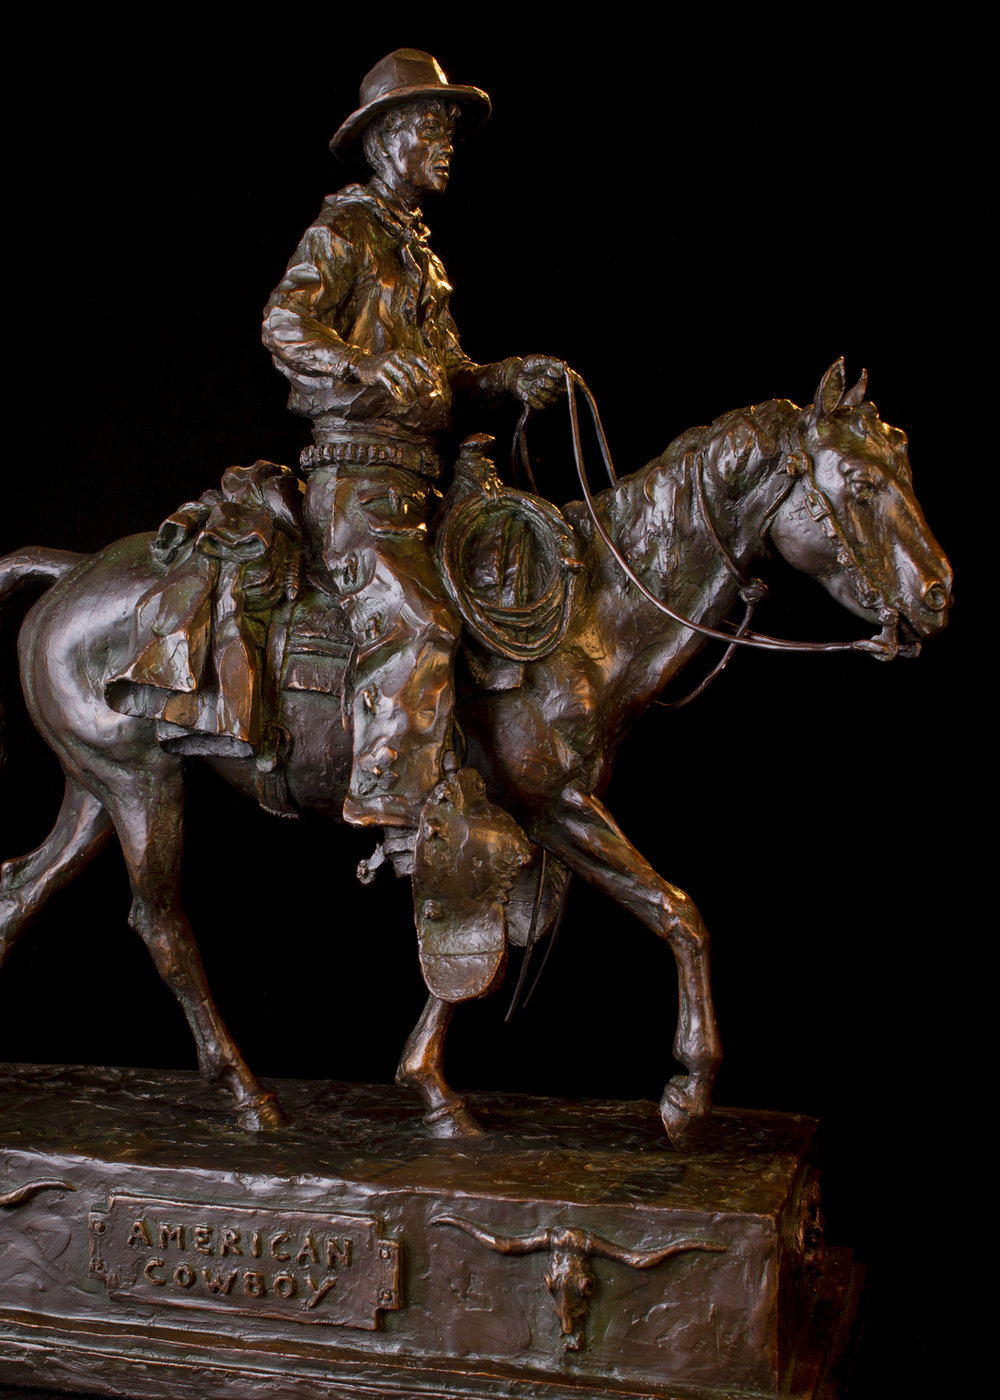 "American Cowboy  | 24.5"" x 22"" x 9.5"" | Bronze | $6,200 | Edition of 30"